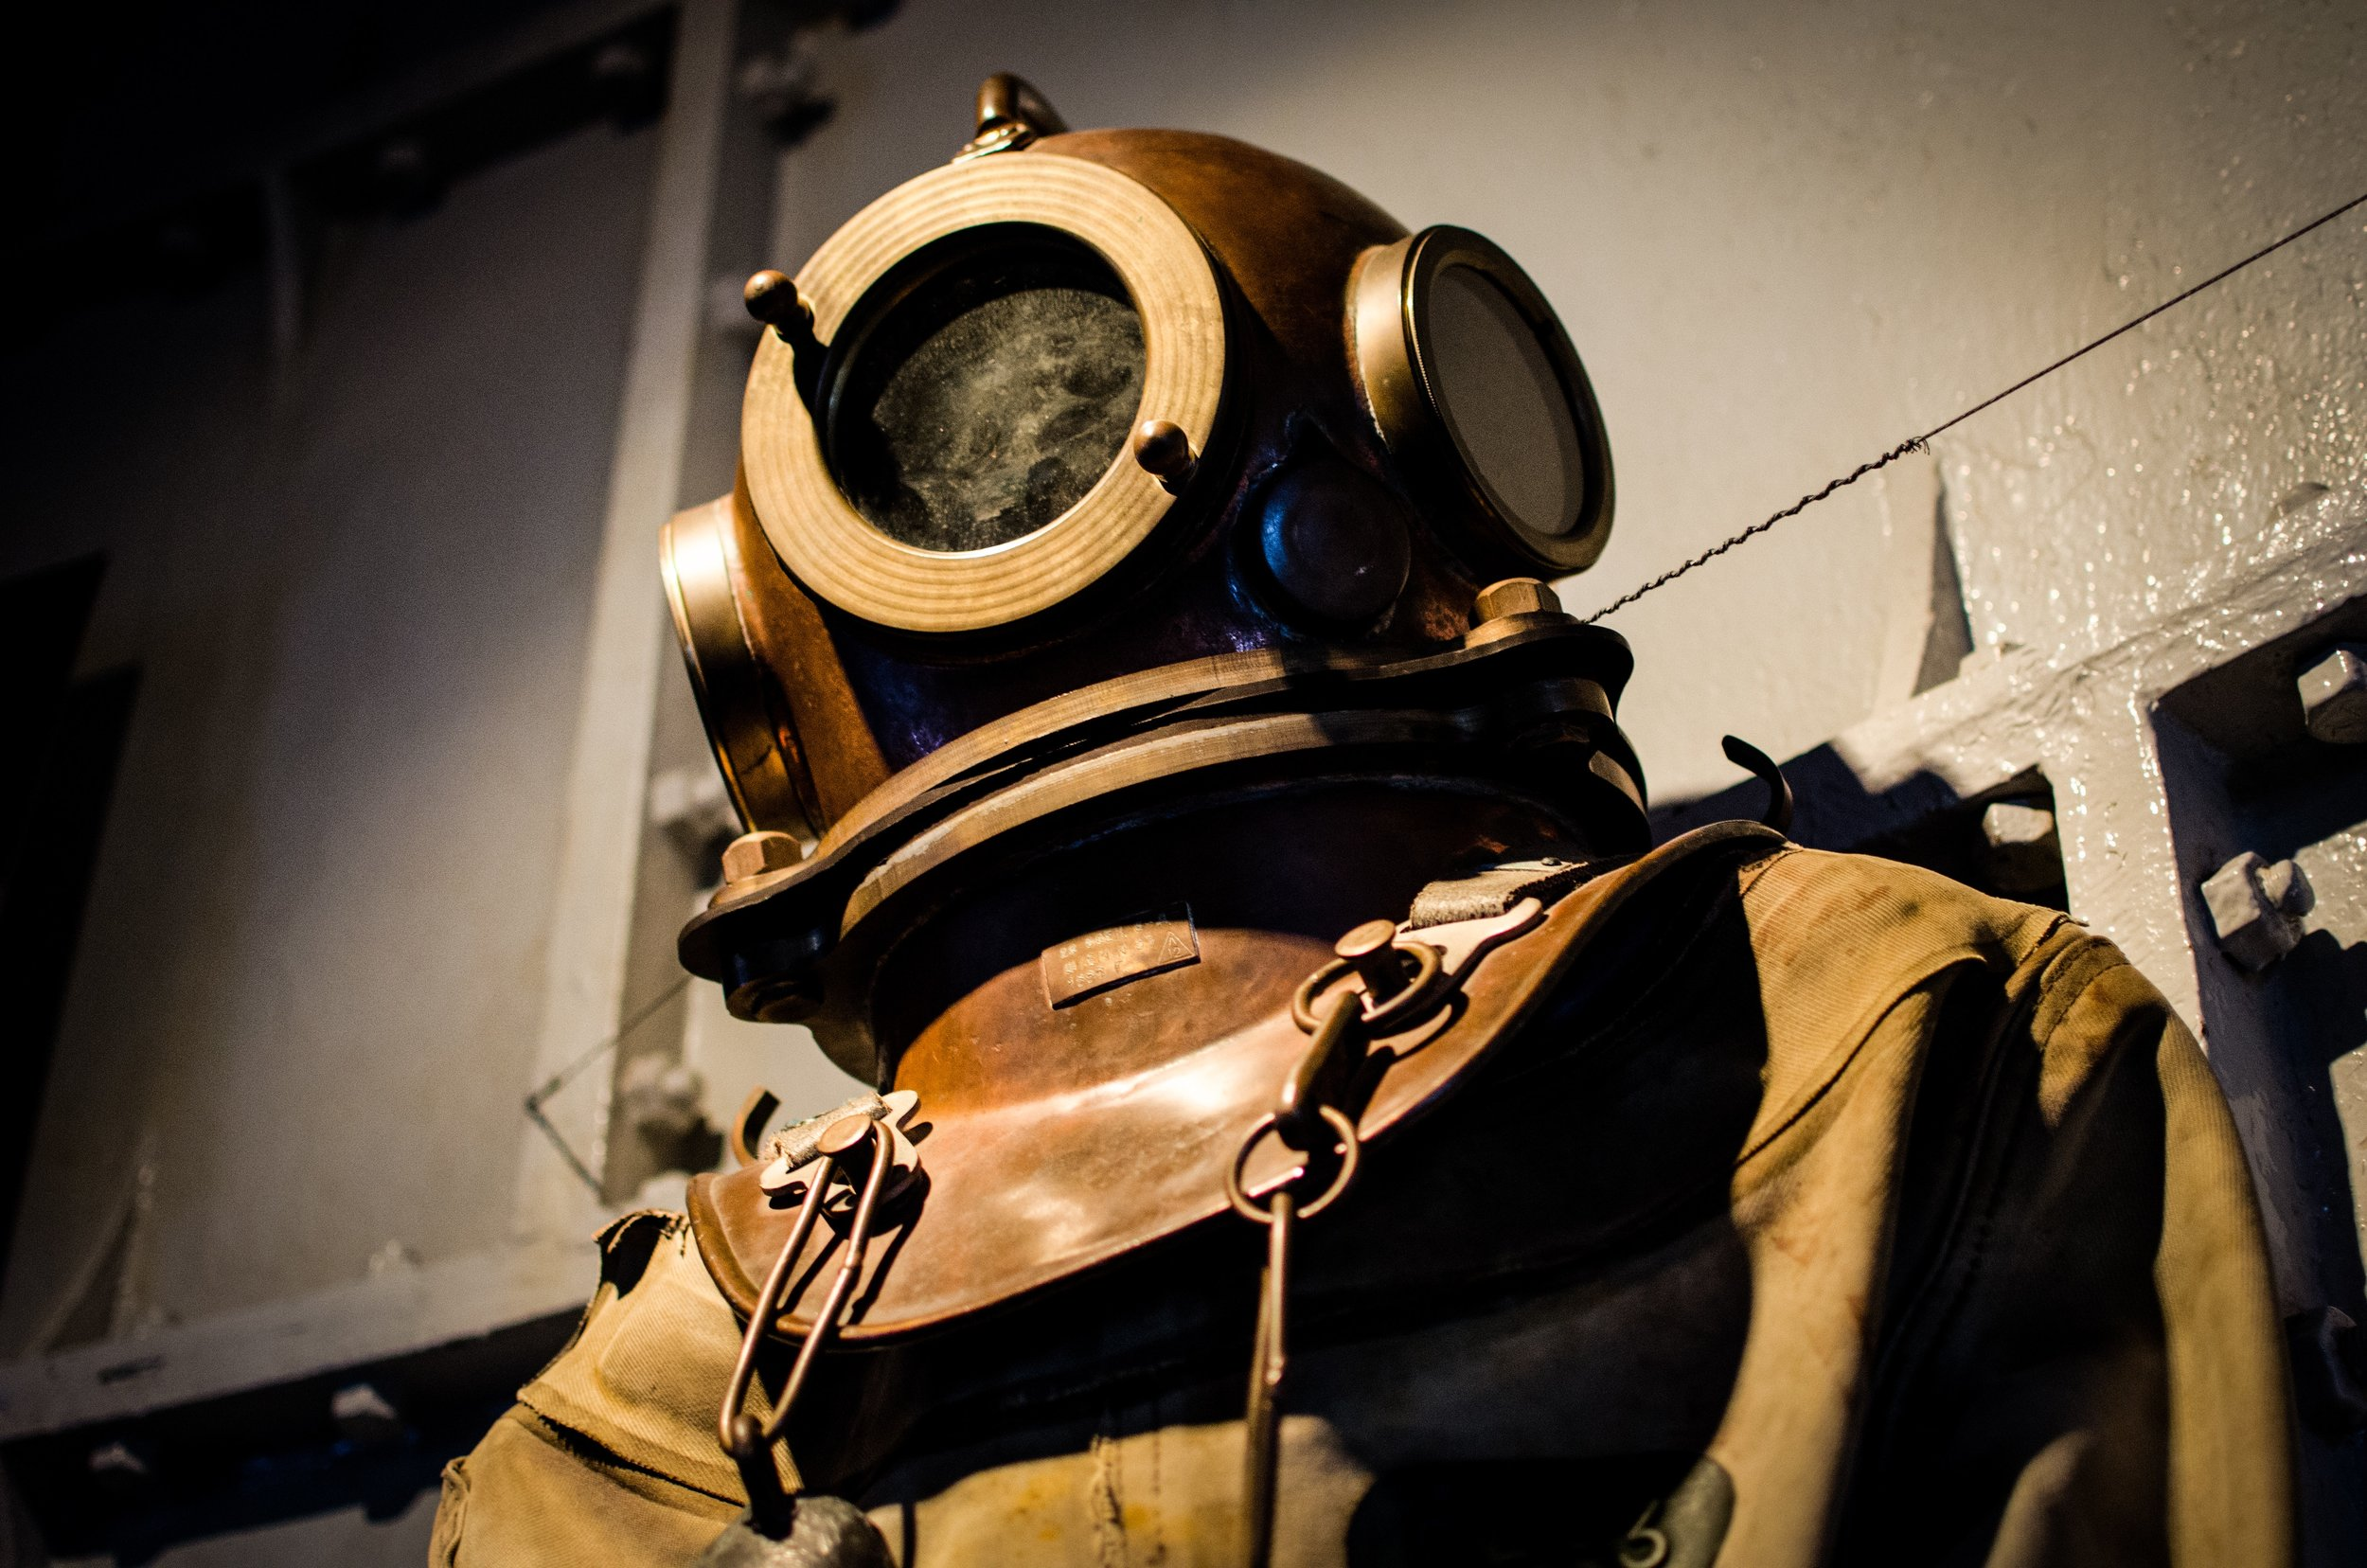 diver-diving-suit-historical-718.jpg